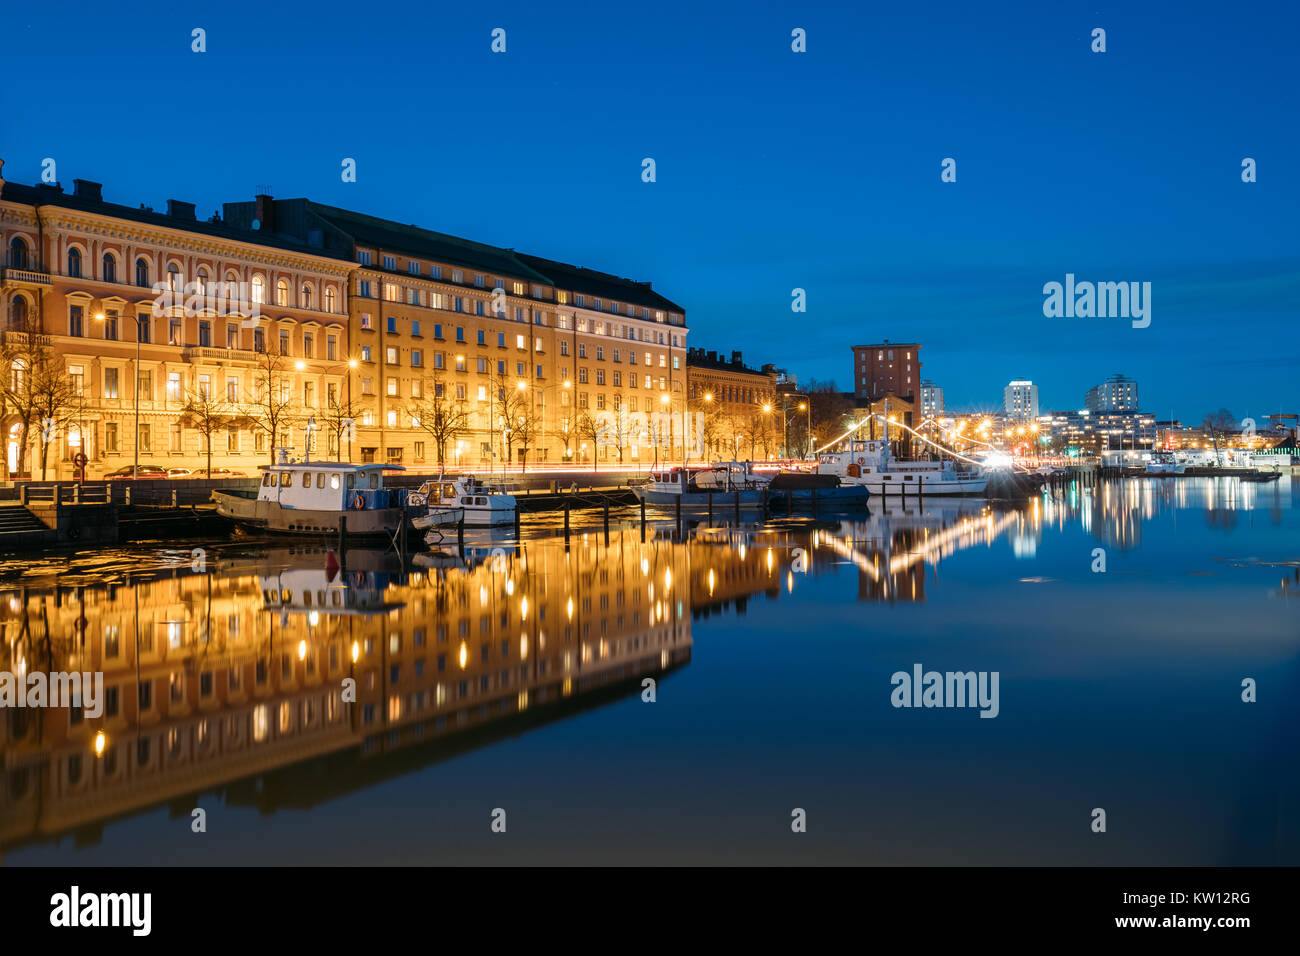 Helsinki, Finland. View Of Pier With Boats And Pohjoisranta Street In Evening Night Illuminations. - Stock Image